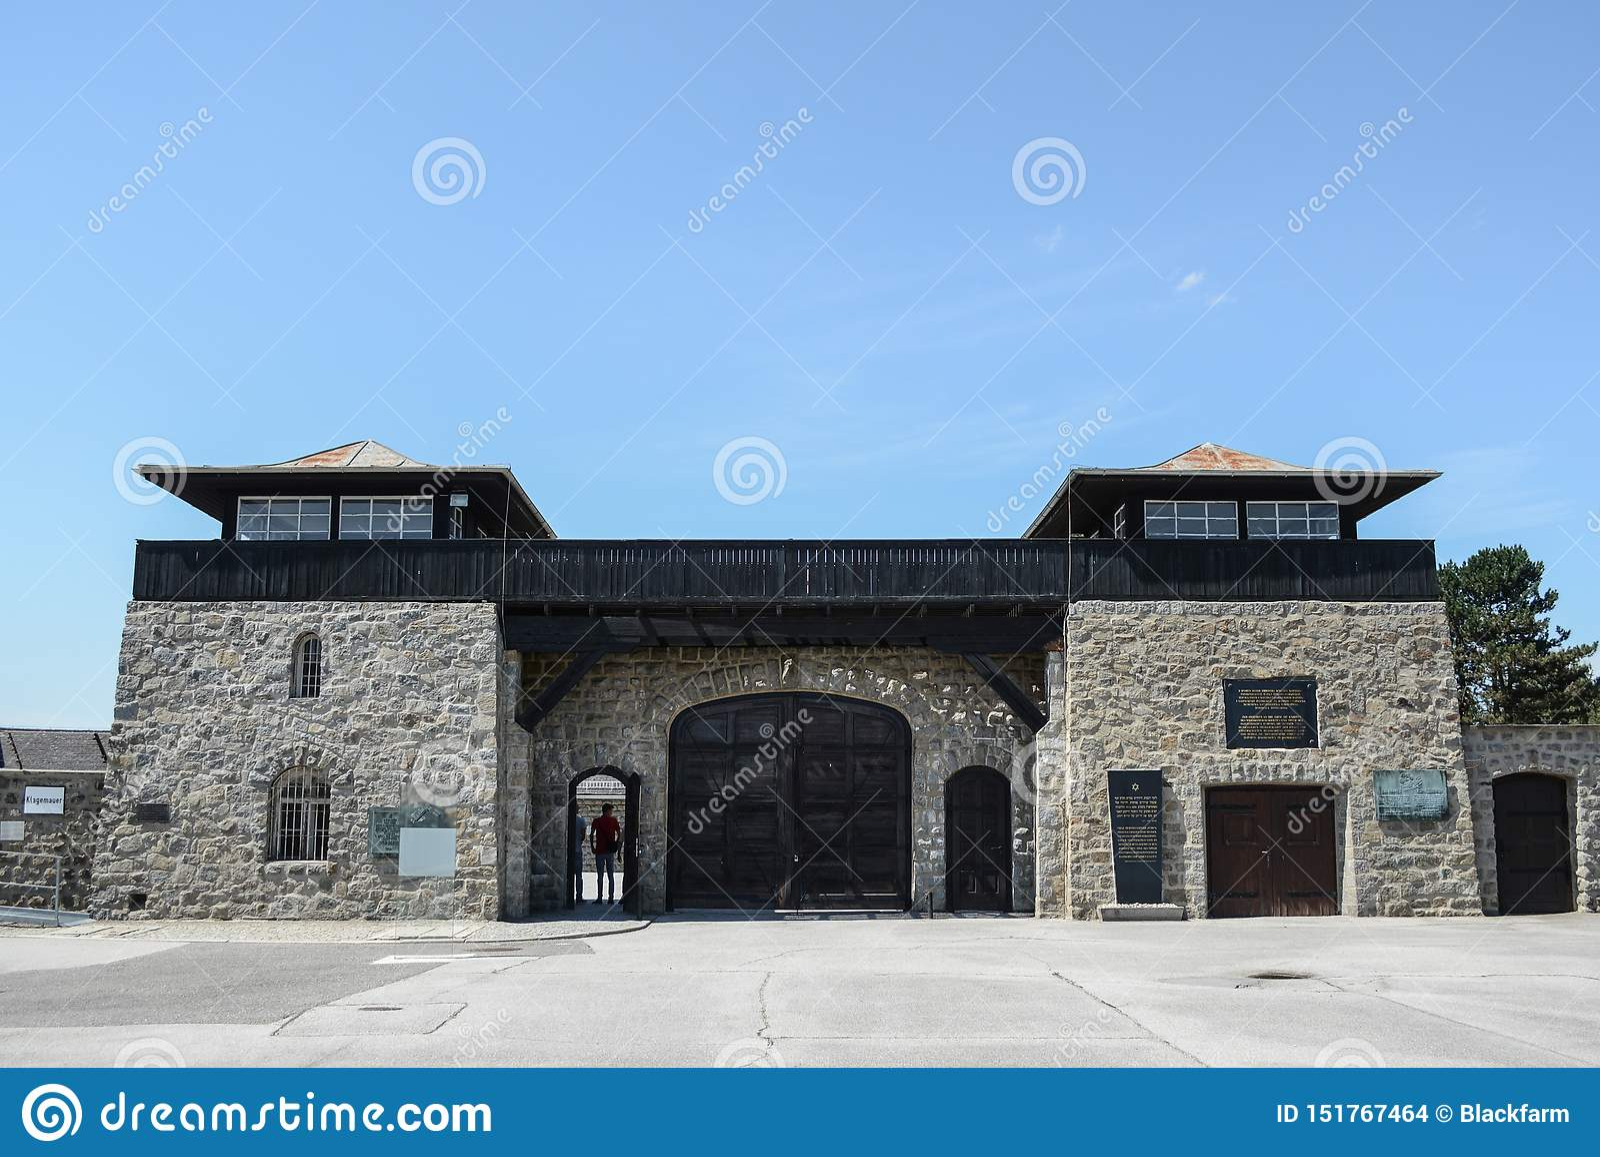 Arkansas Traveler: Mauthausen Concentration Camp